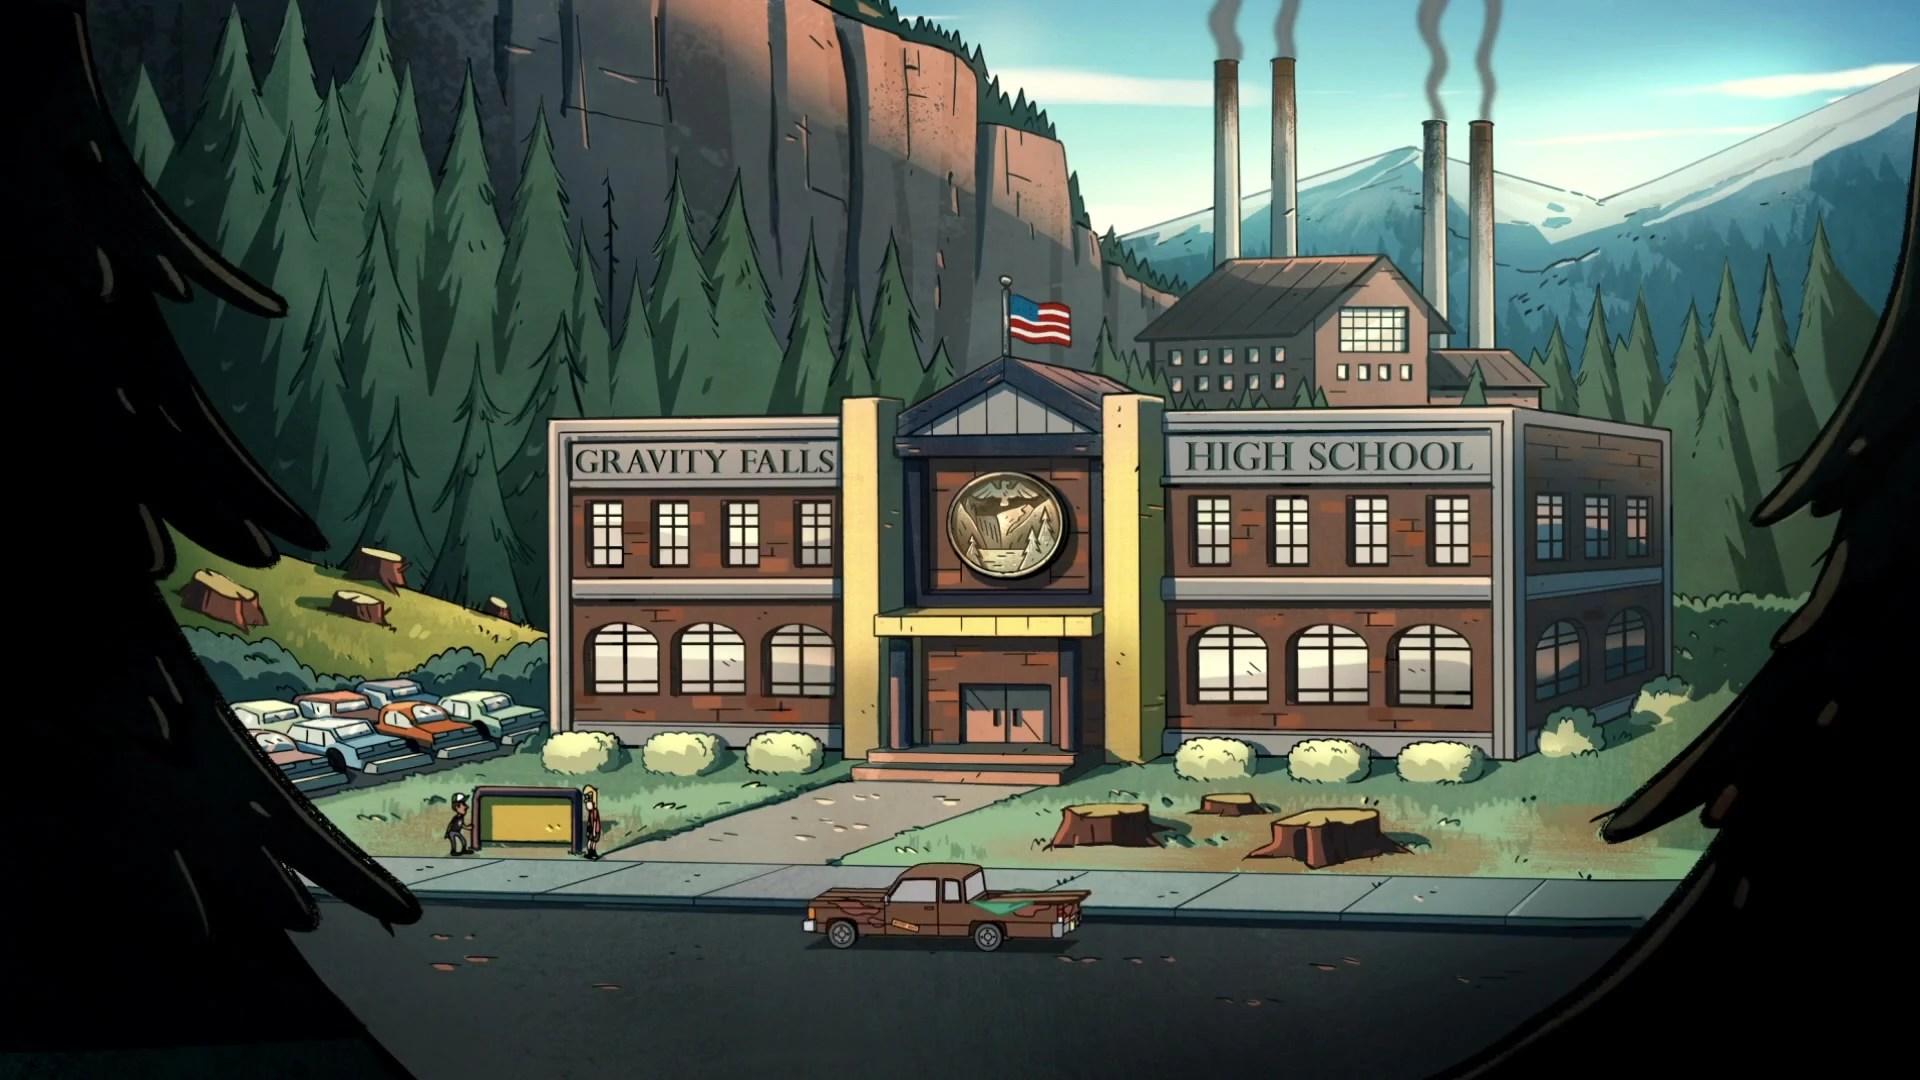 Gravity Falls Waddles Wallpaper Gravity Falls High School Gravity Falls Wiki Fandom